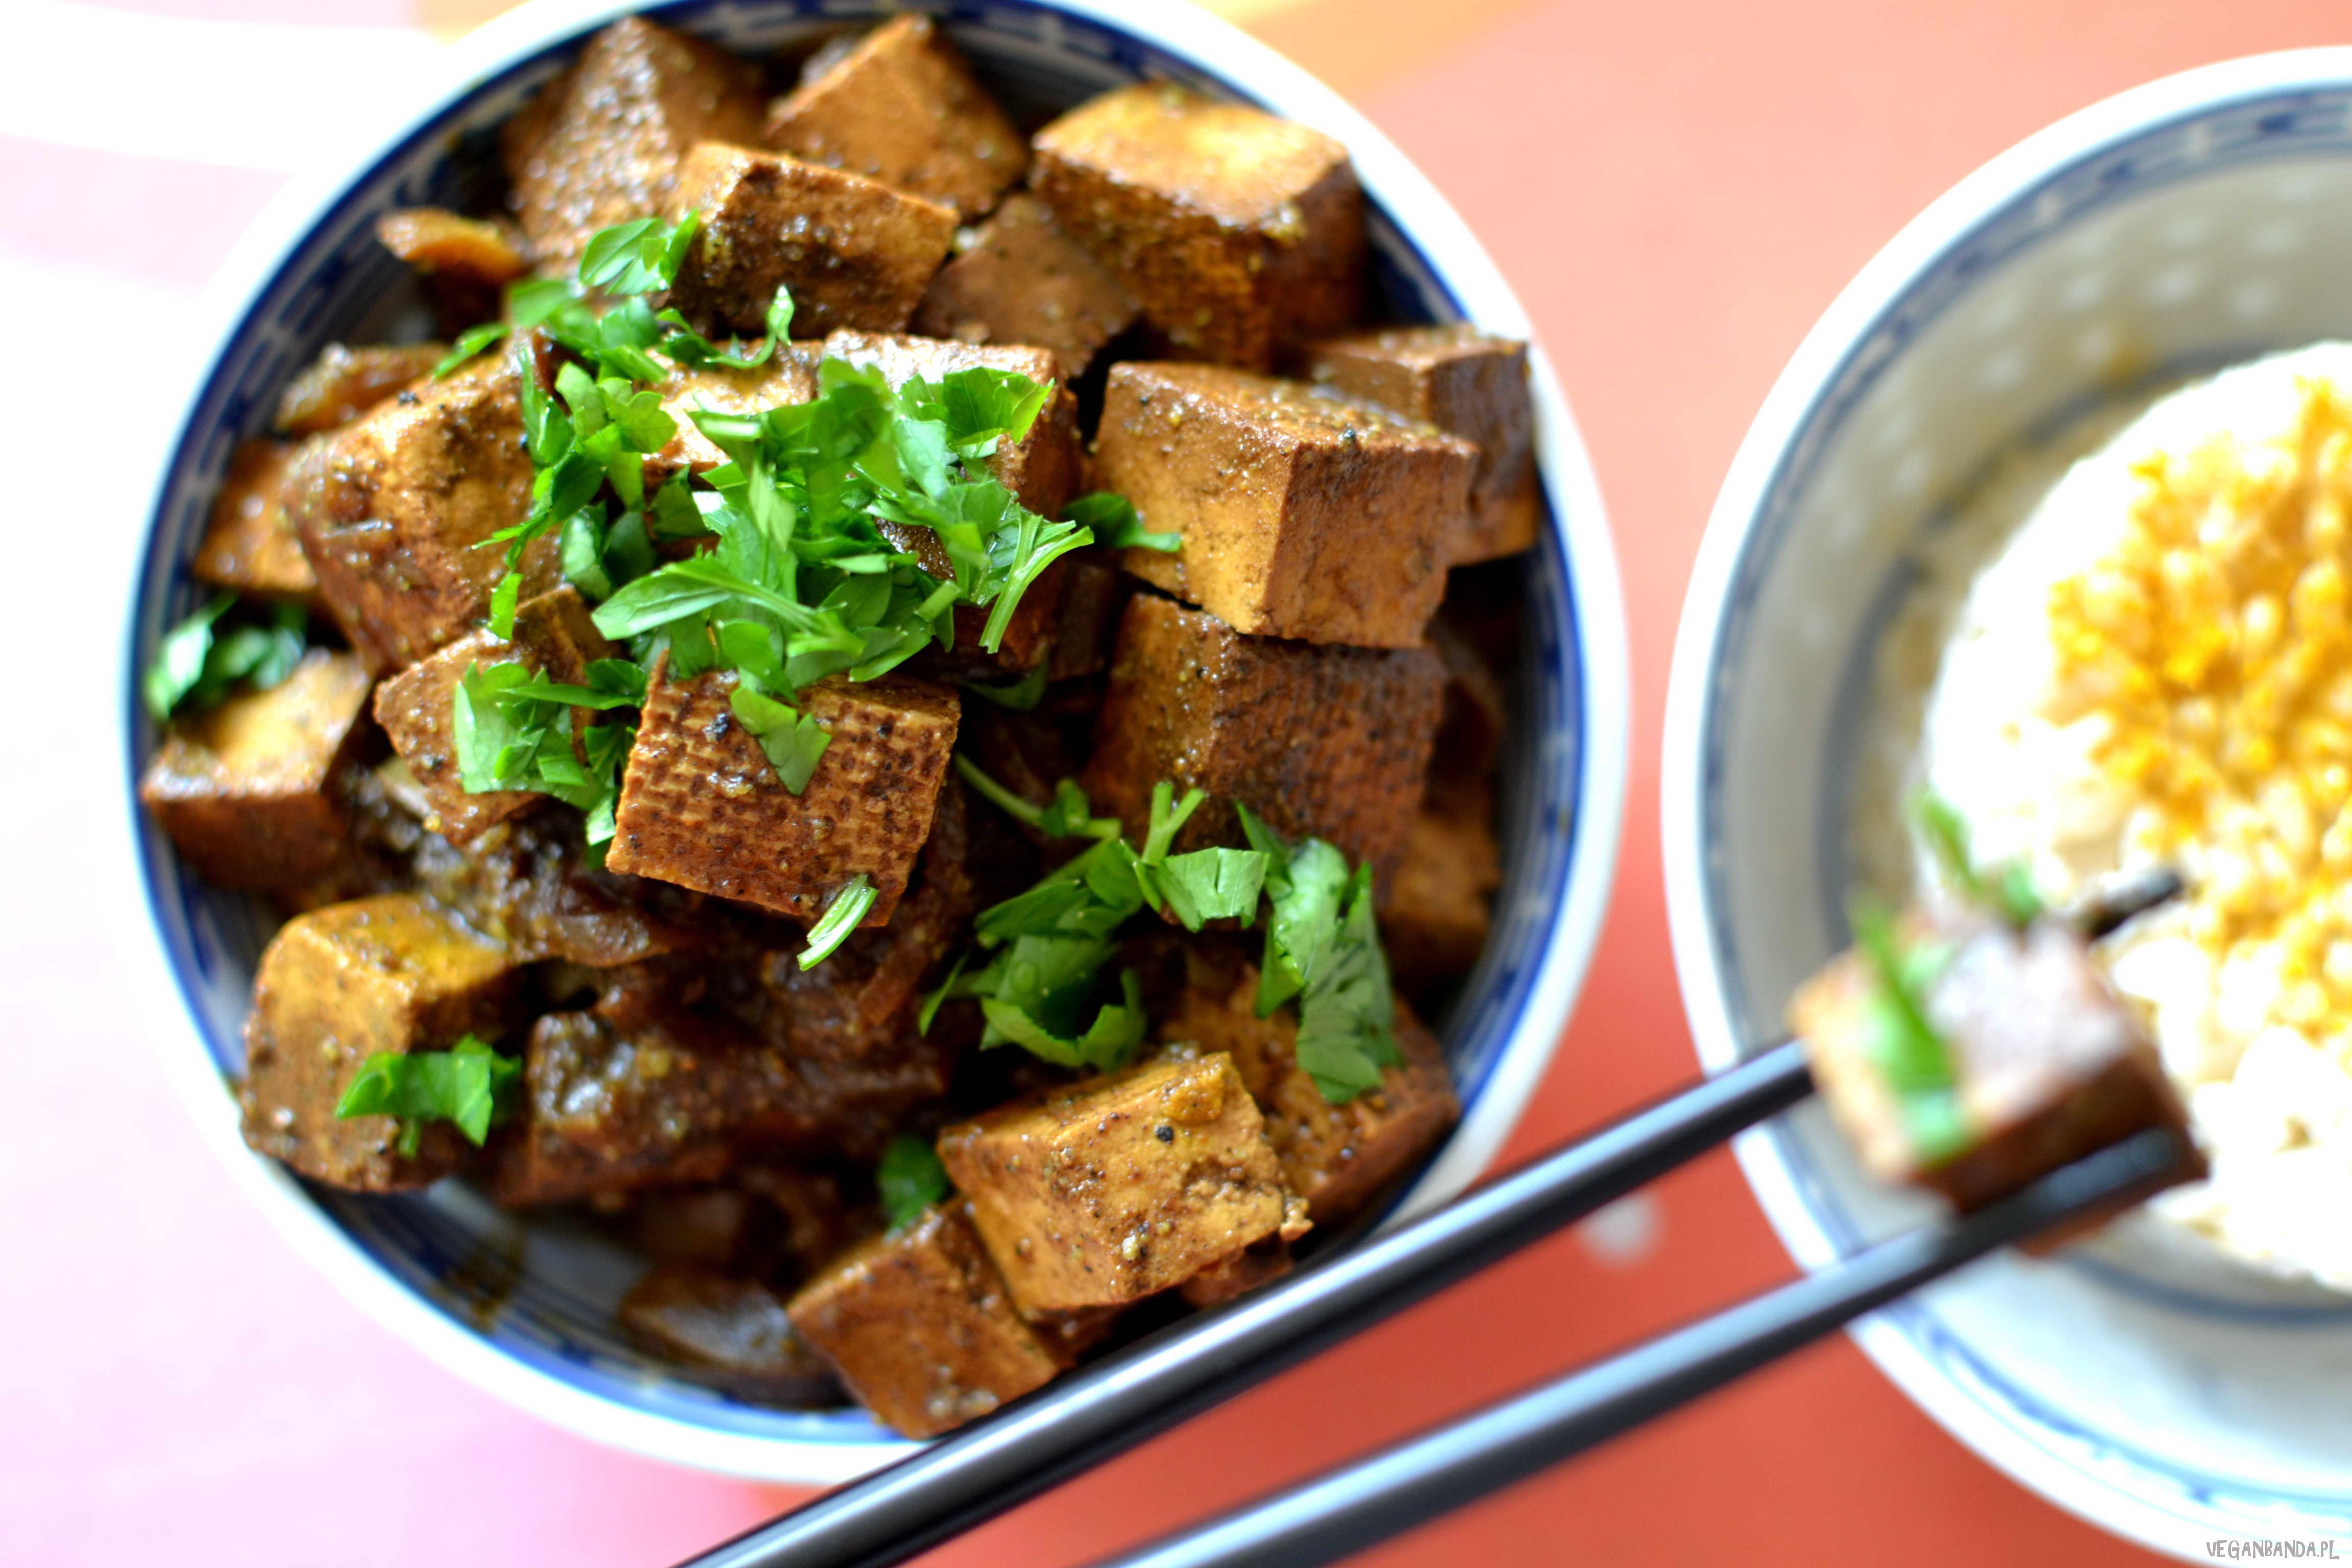 Wedzone Tofu W Pieciu Smakach Veganbandaveganbanda